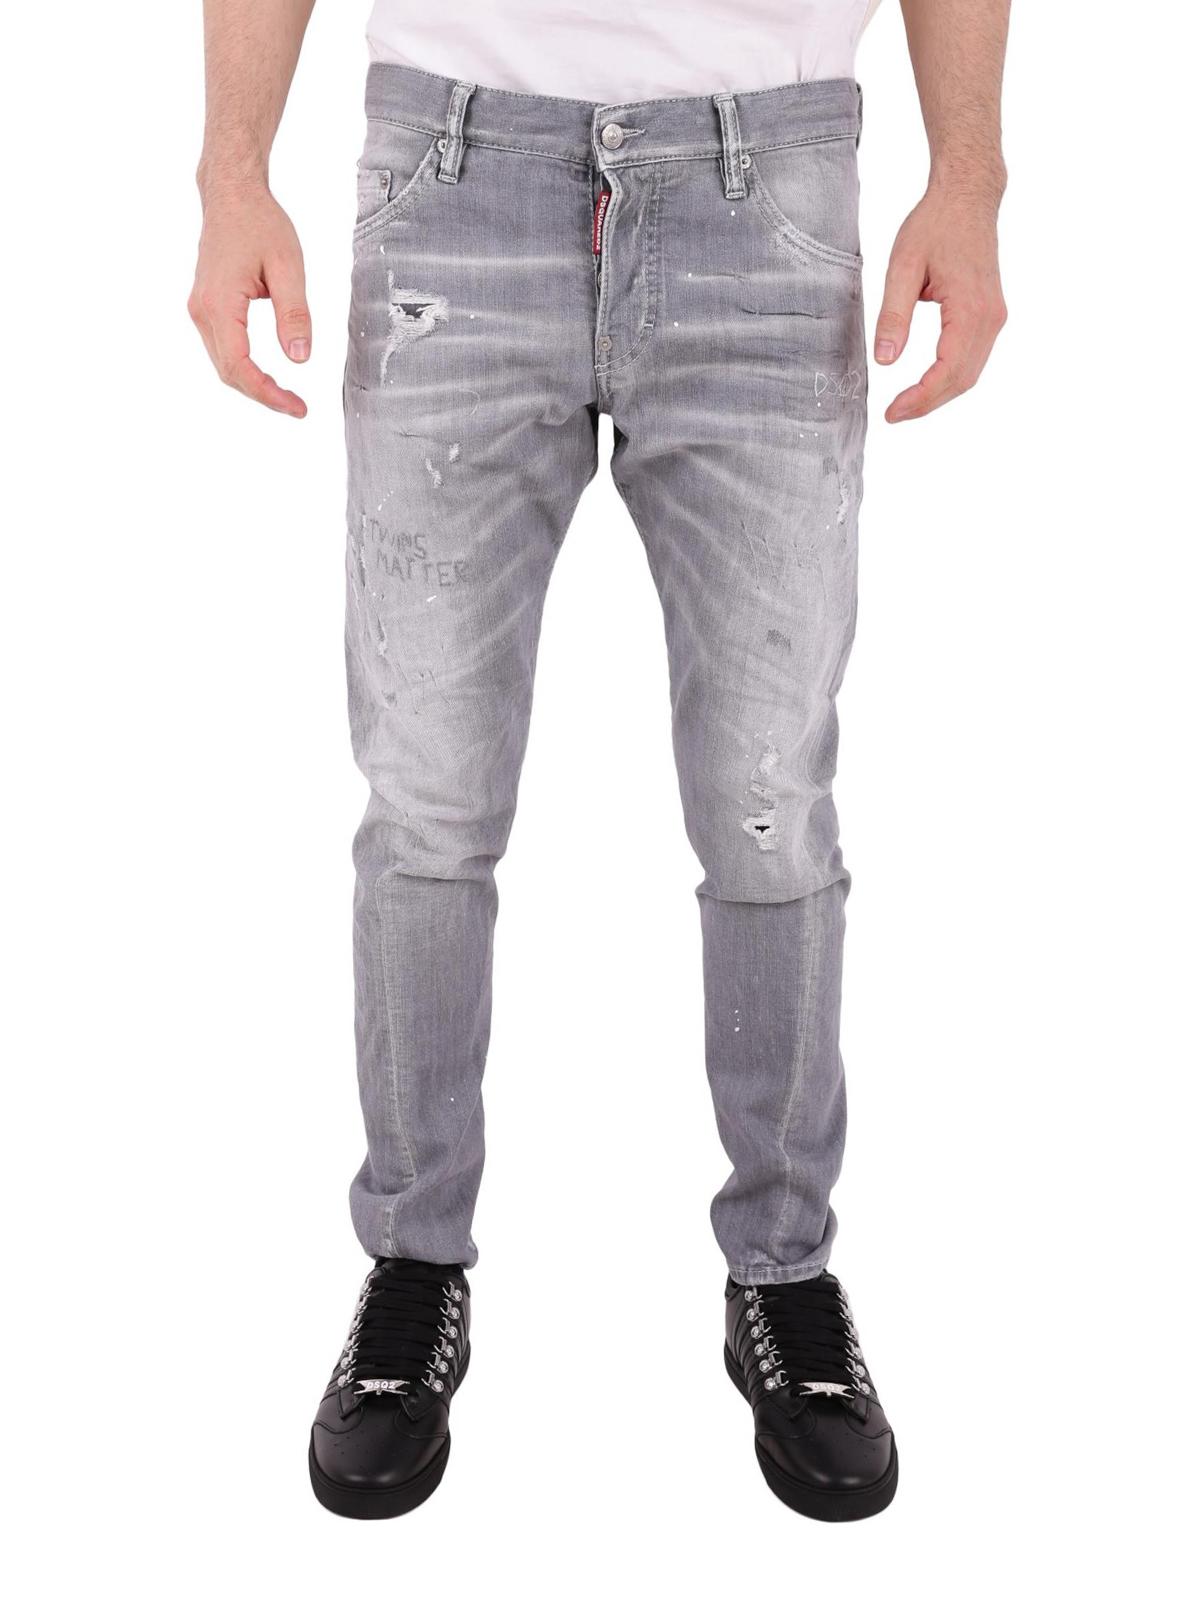 03829701e Dsquared2 - Jean Droit - Sexy Twist - Jeans à jambe droite ...